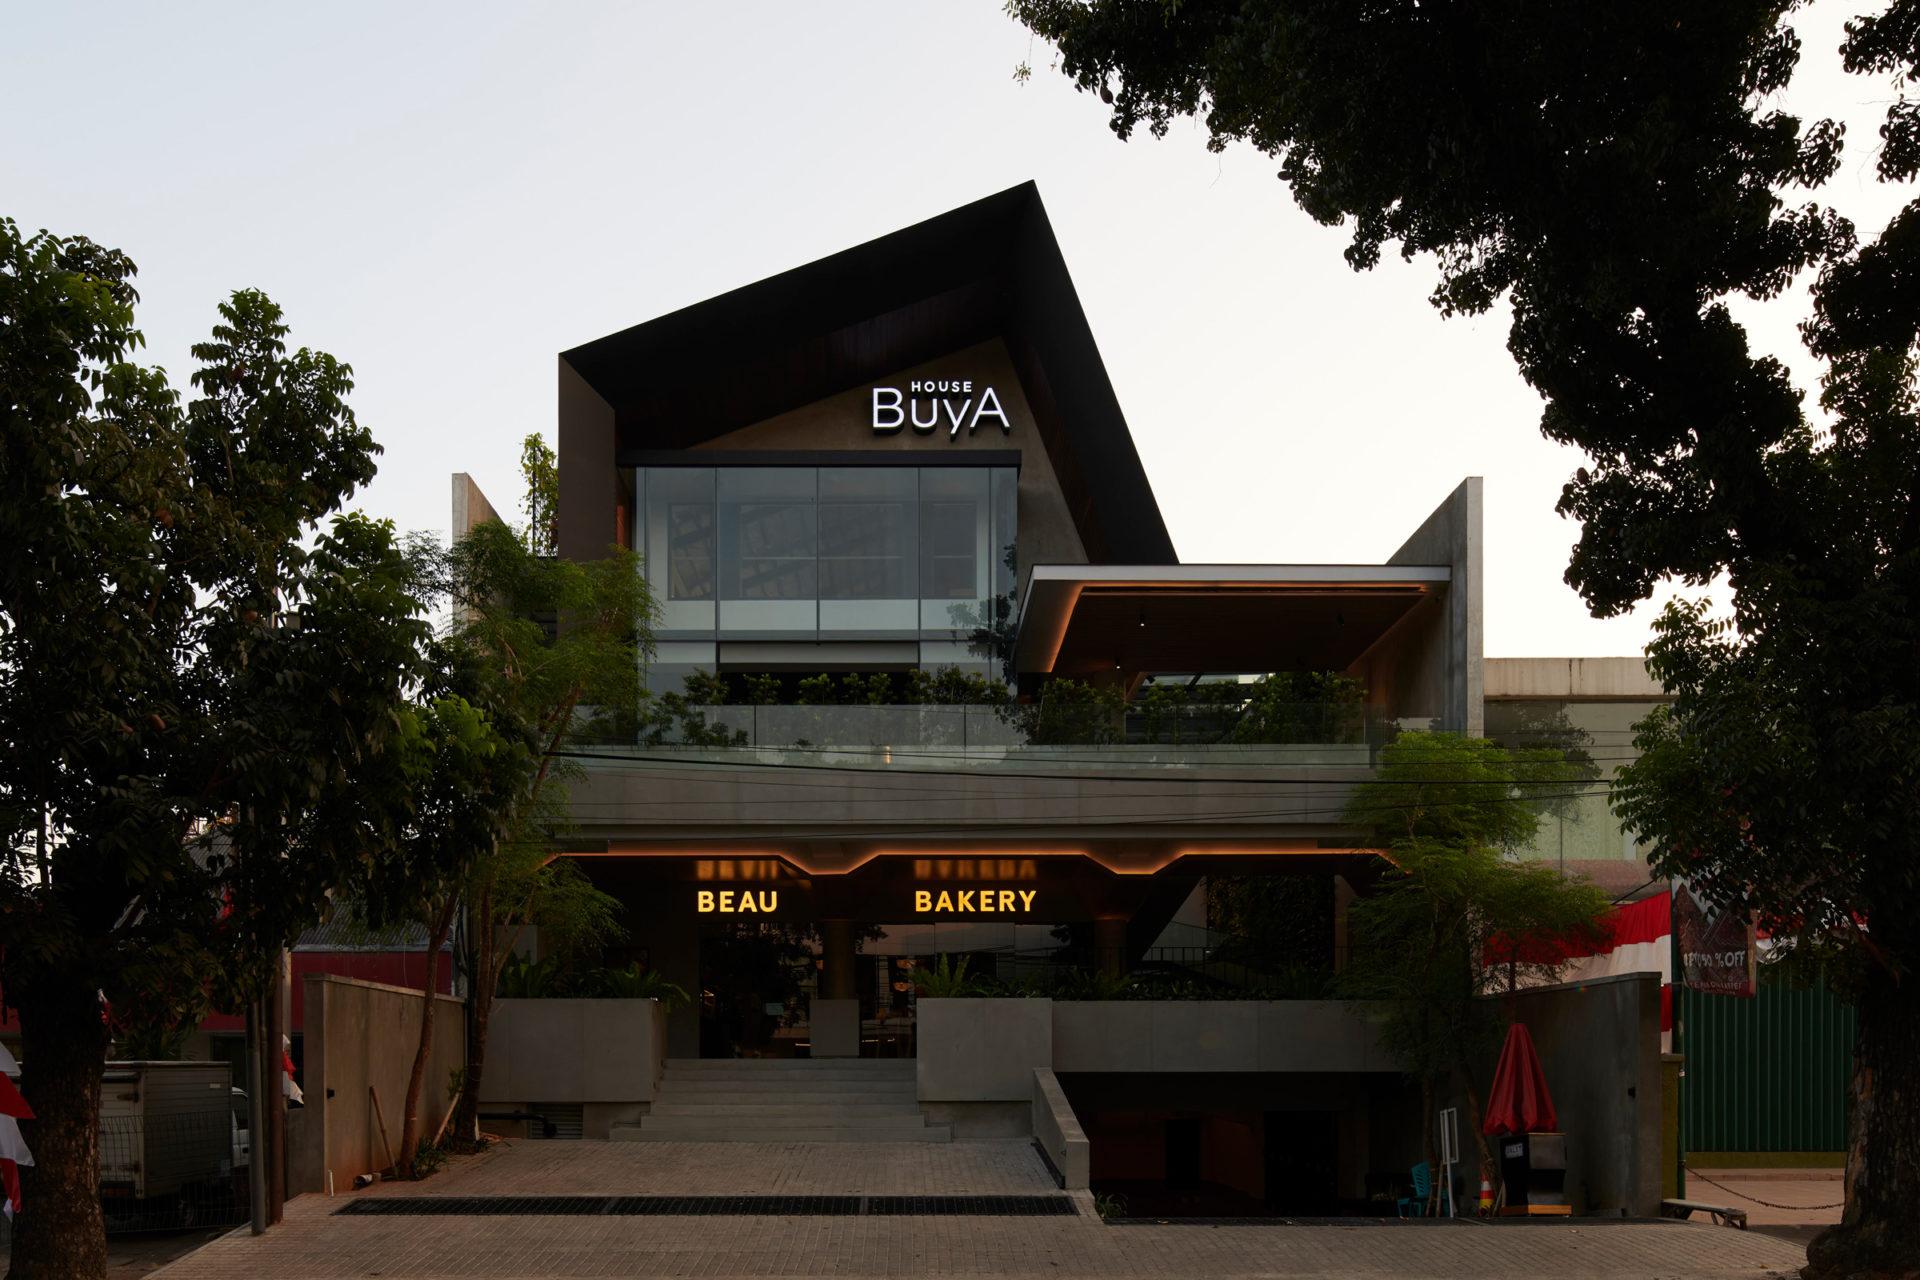 buya-house-building-01